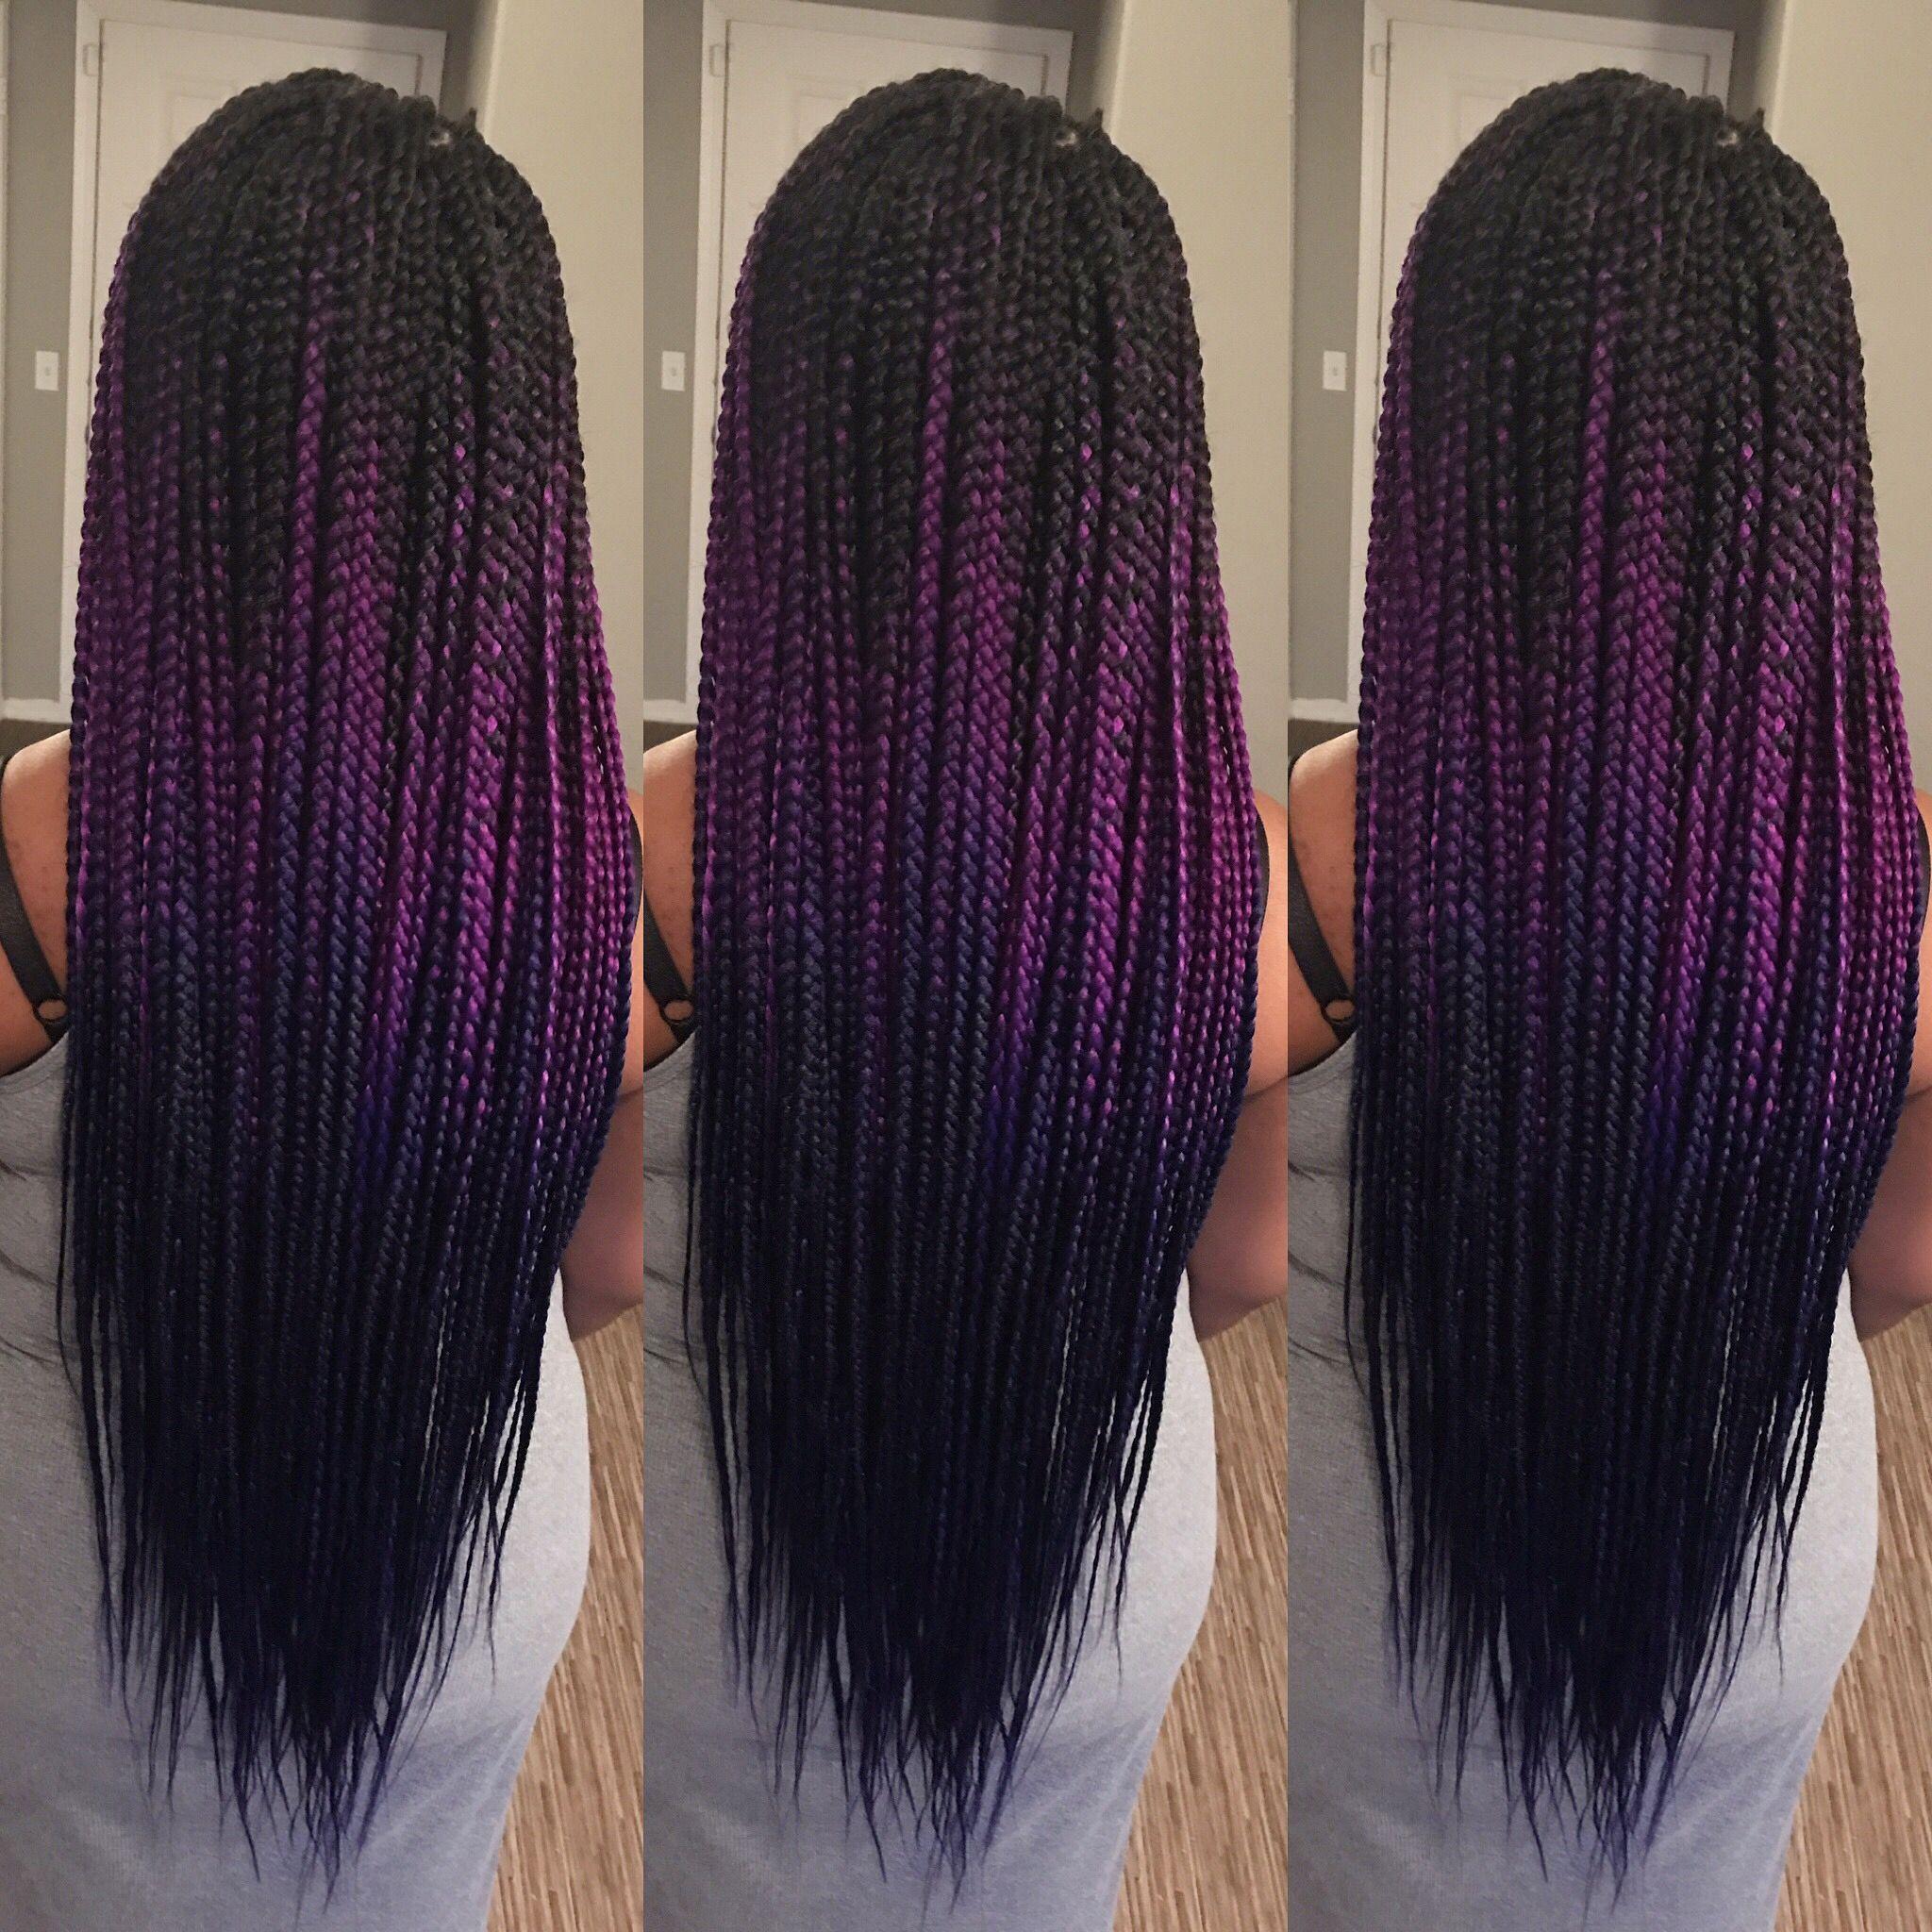 Phoenix Tempe Hairstylist Book Online Www Marmarzdivinestylez Com 520 371 3100 5151 E Guadalupe Rd P Braided Hairstyles Curly Hair Styles Hair Styles